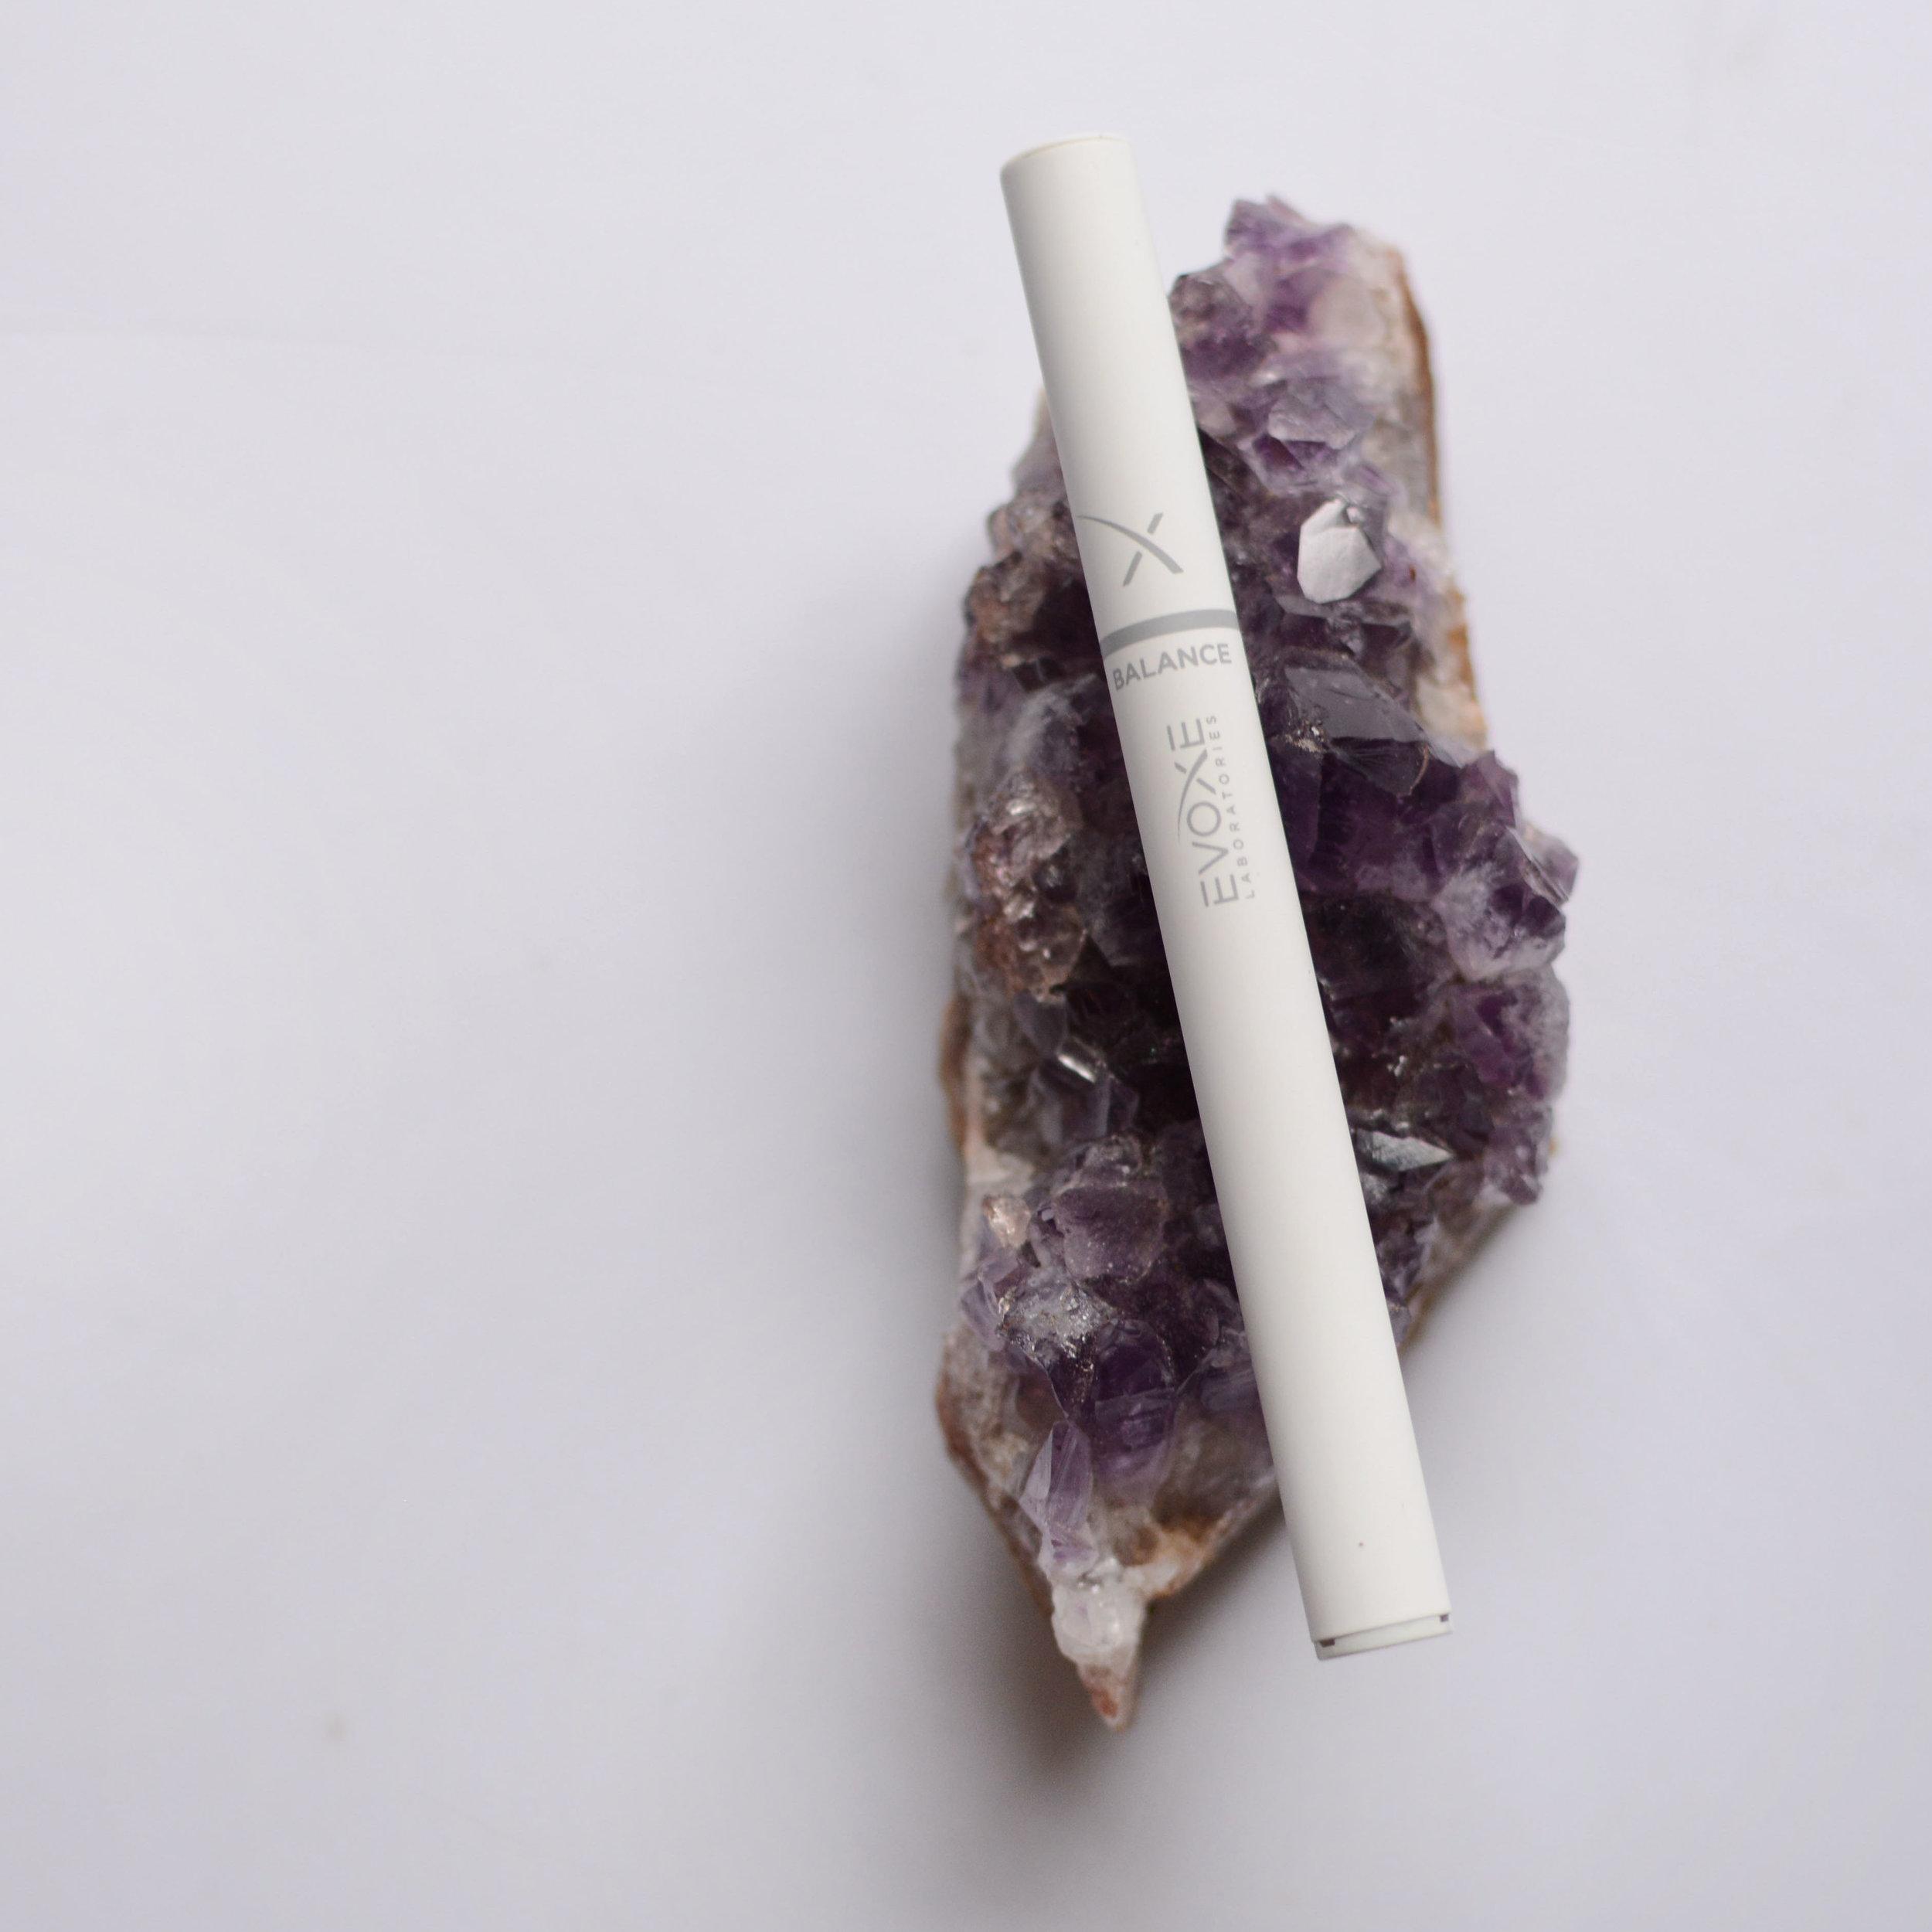 evoxe-vaporizer-amethyst